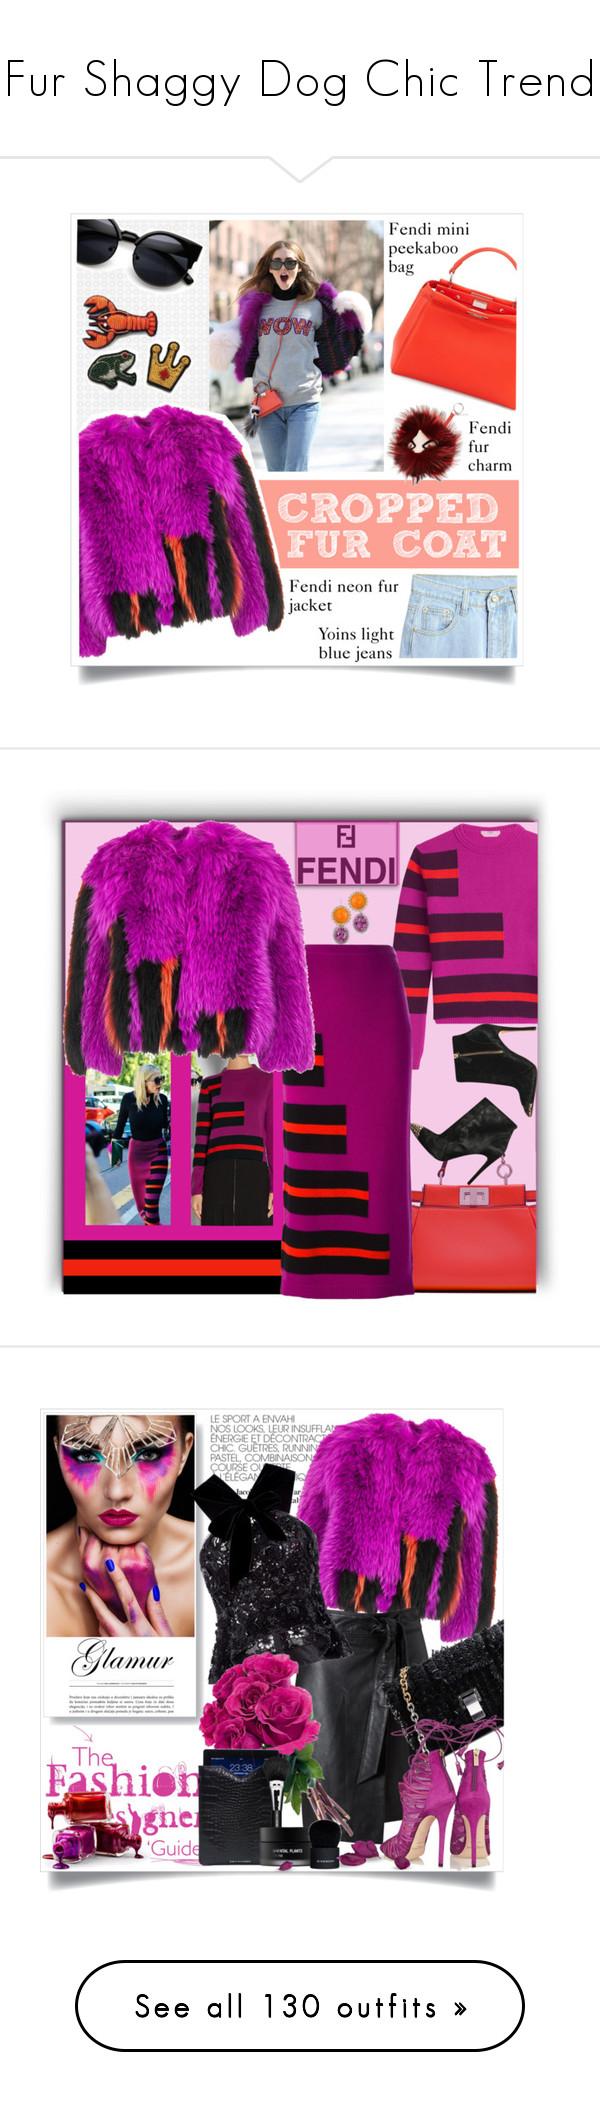 """Fur Shaggy Dog Chic Trend"" by yours-styling-best-friend ❤ liked on Polyvore featuring Fendi, Alice + Olivia, Liz Palacios, croppedfauxfur, Miss Selfridge, Oscar de la Renta, Proenza Schouler, Jimmy Choo, Driftwood and MAC Cosmetics"